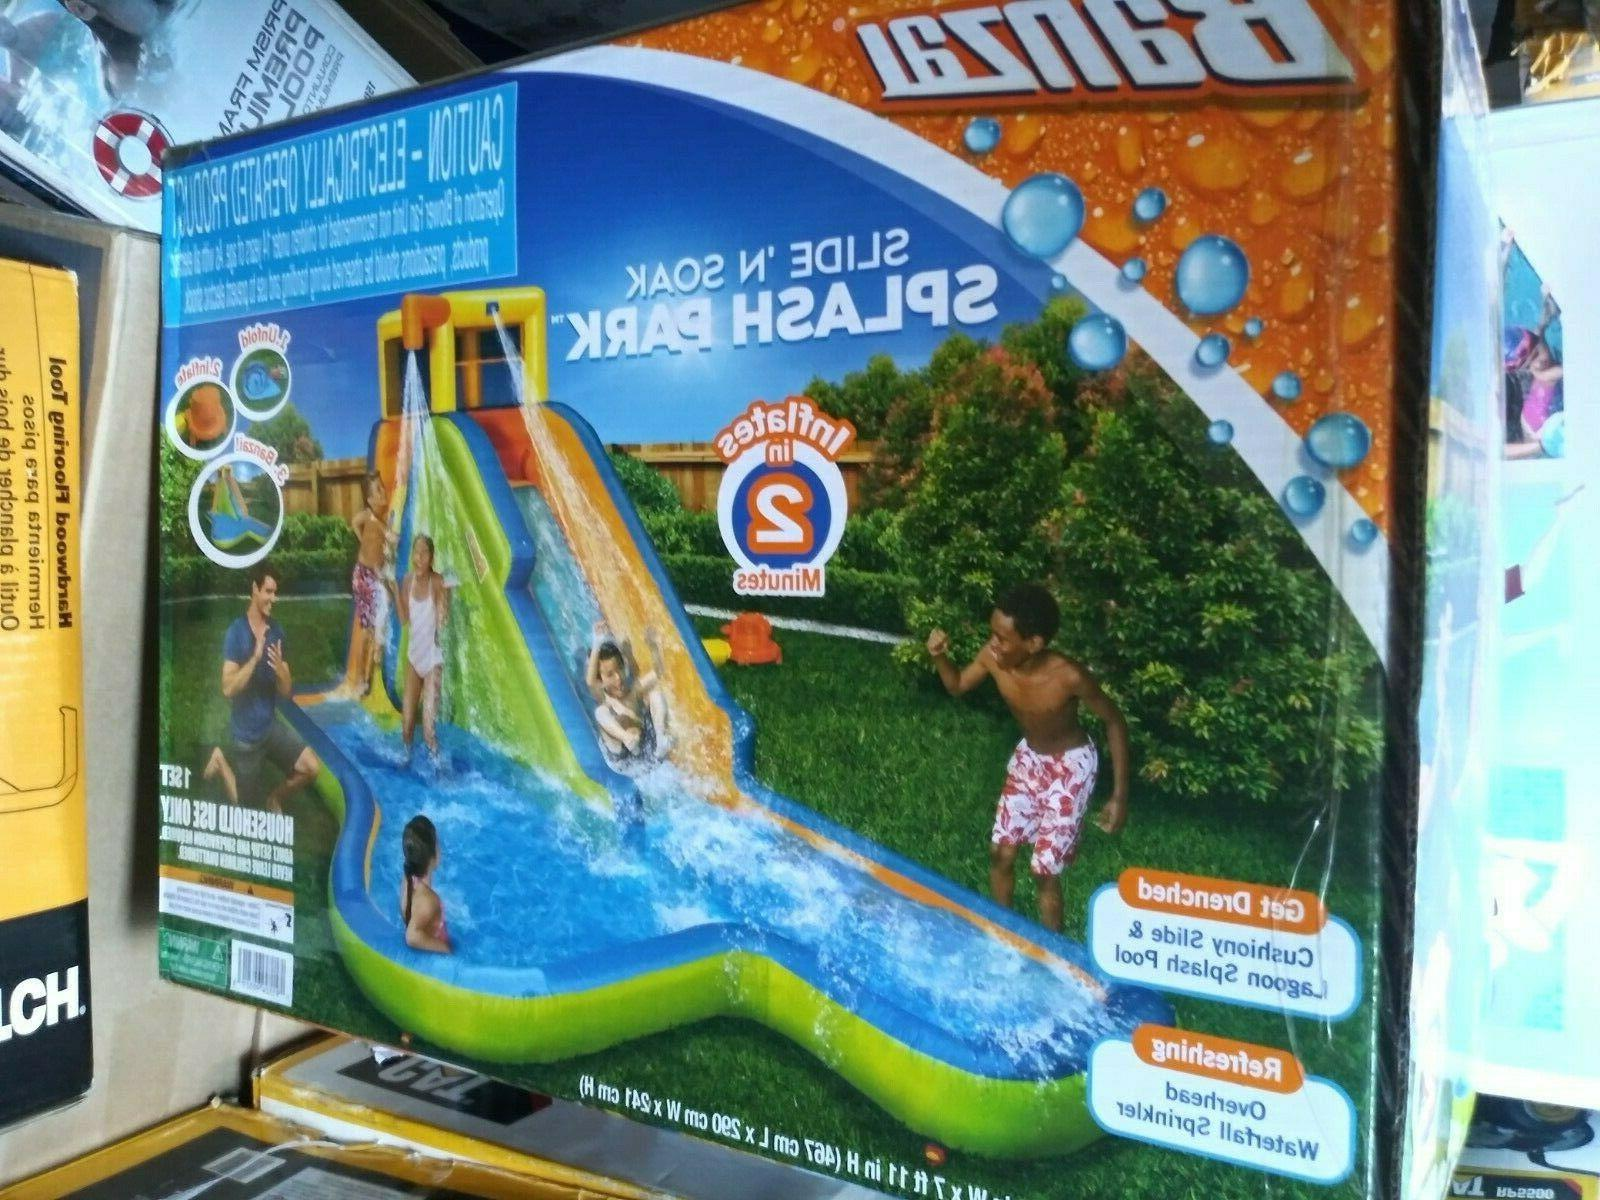 new 90321 slide n soak splash park